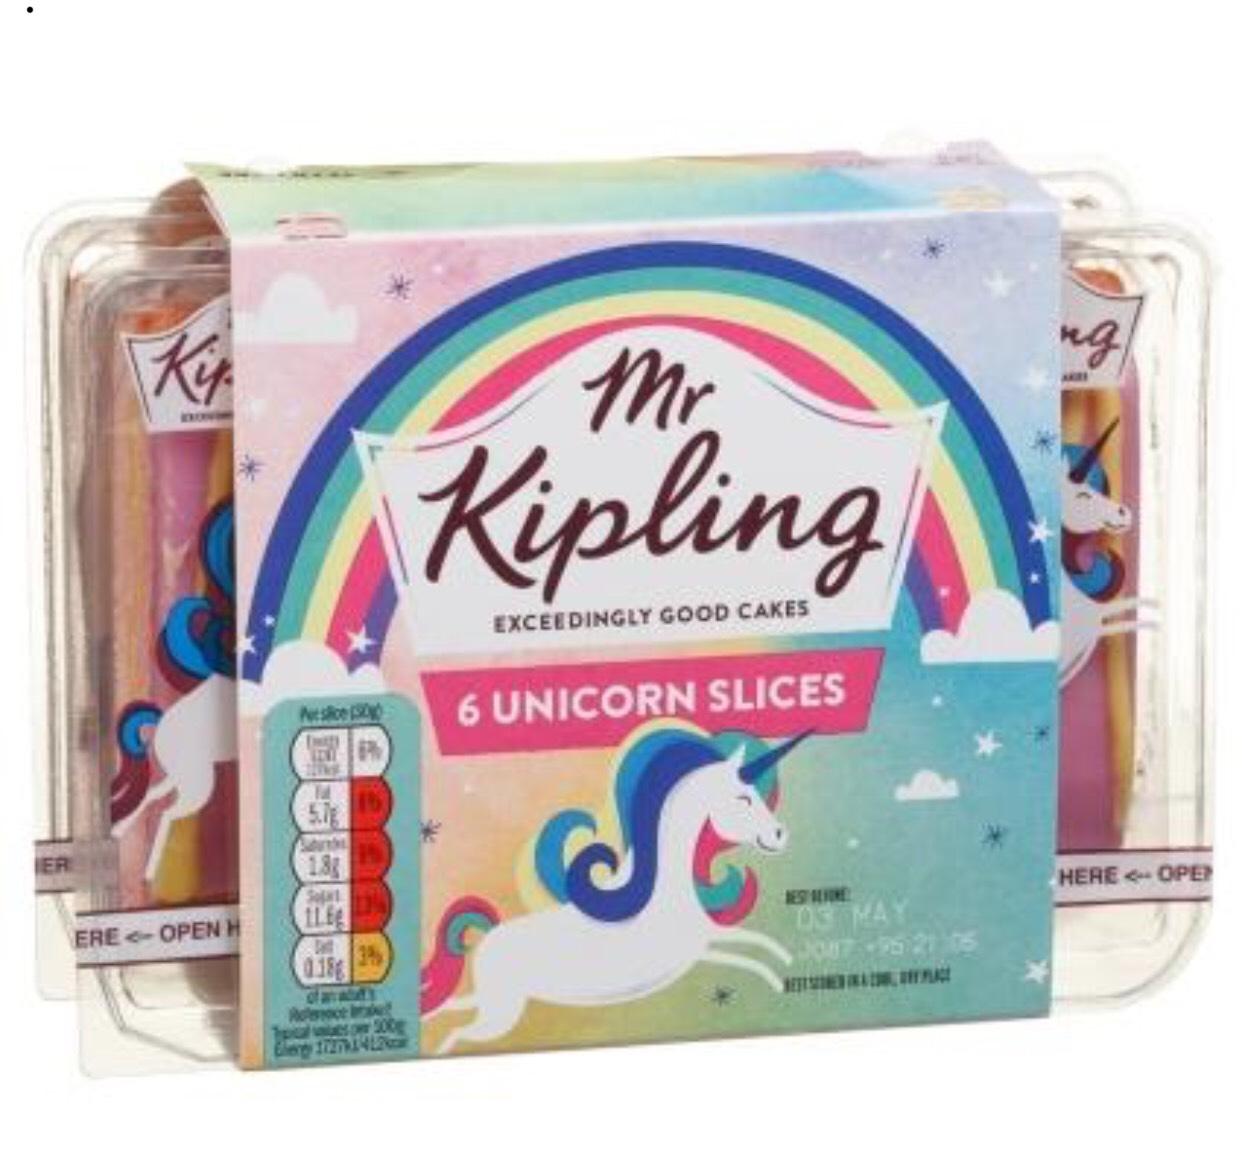 [Rollback] Unicorn Mr Kipling Slices Pk 6 for £1 at Asda